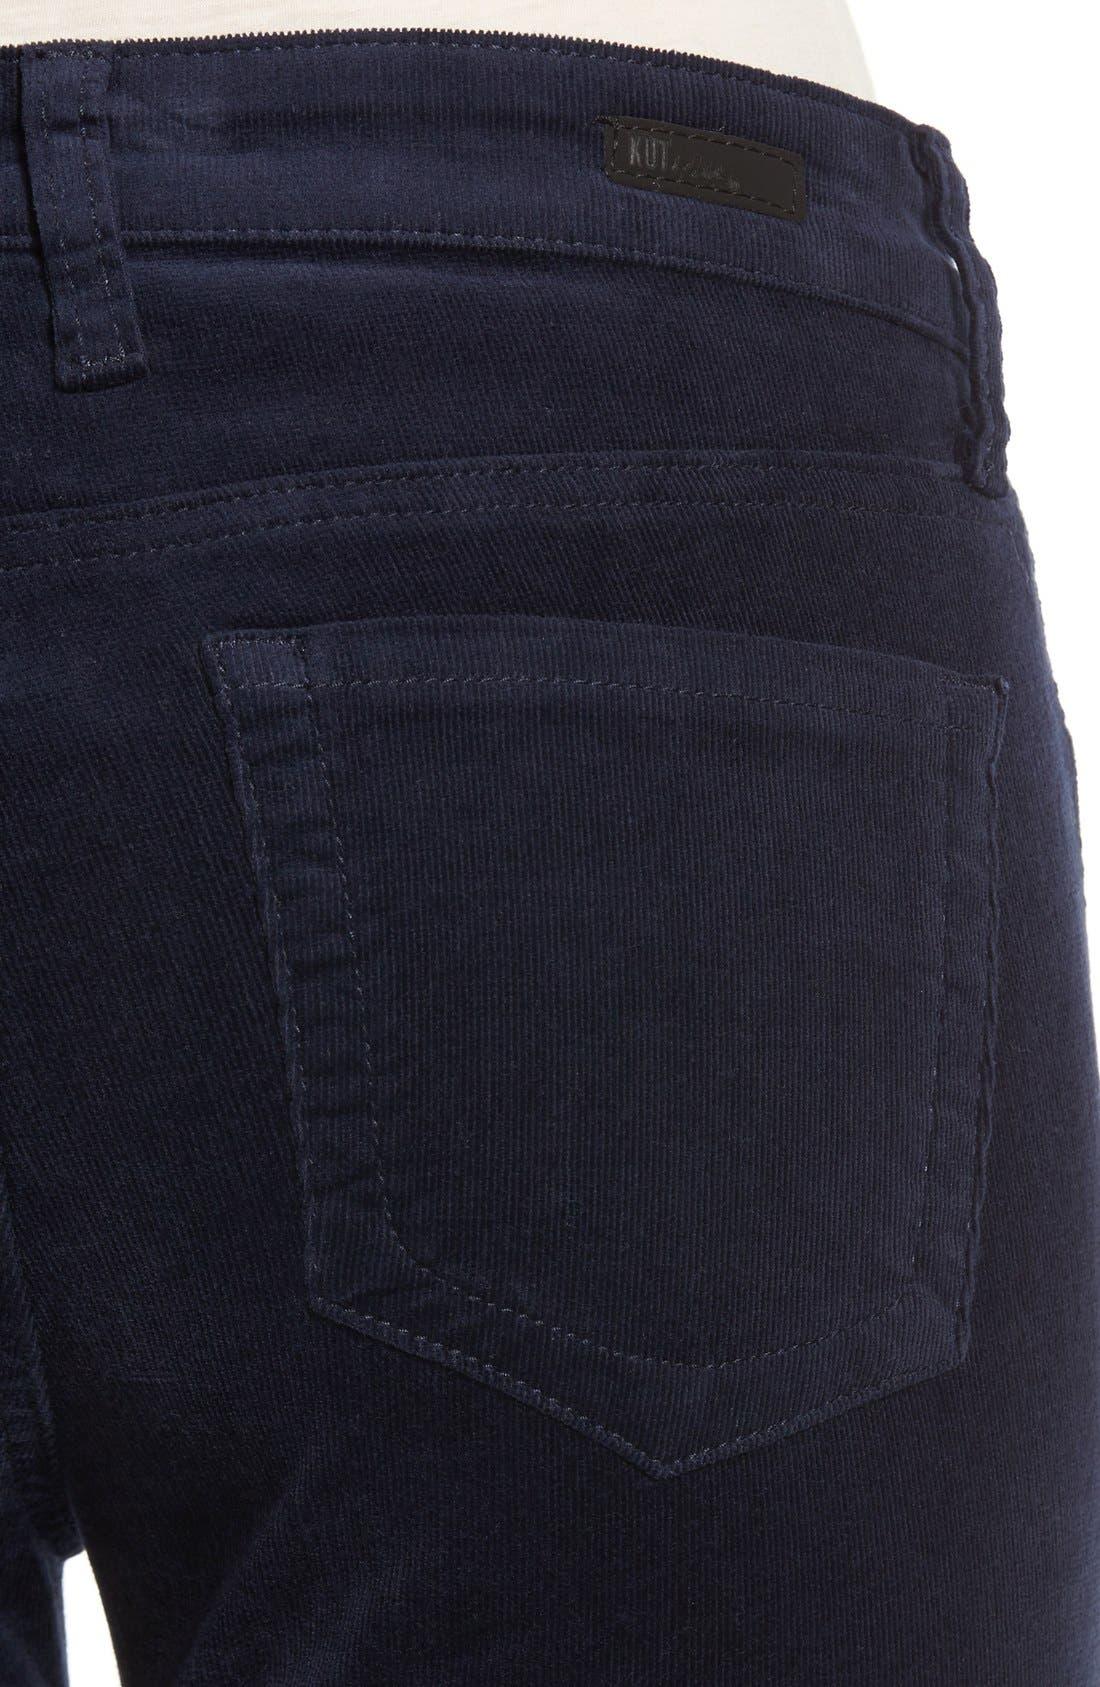 'Diana' Stretch Corduroy Skinny Pants,                             Alternate thumbnail 281, color,